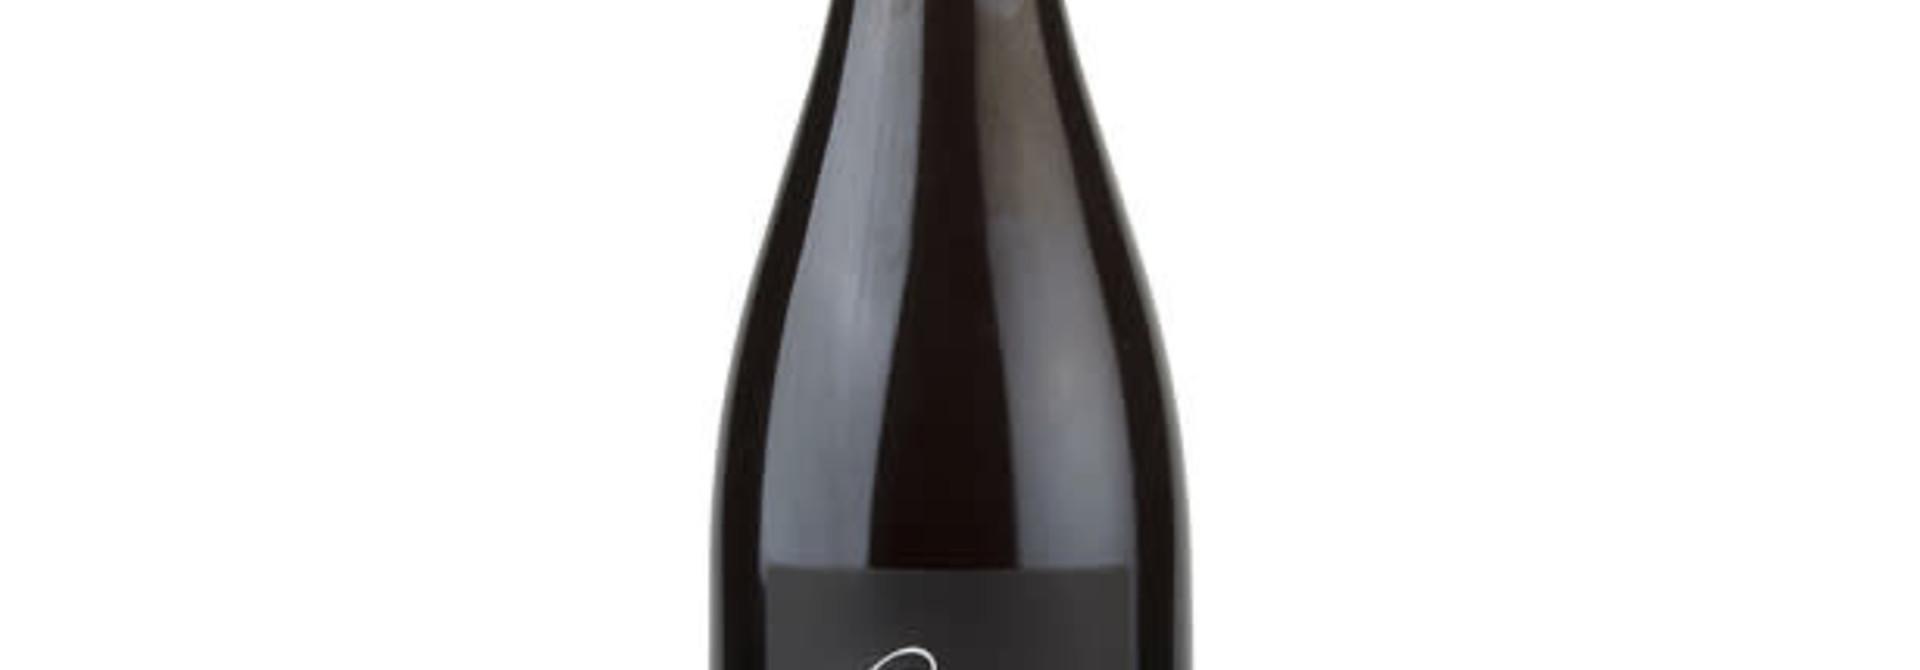 Cerdon Vin de Bugey